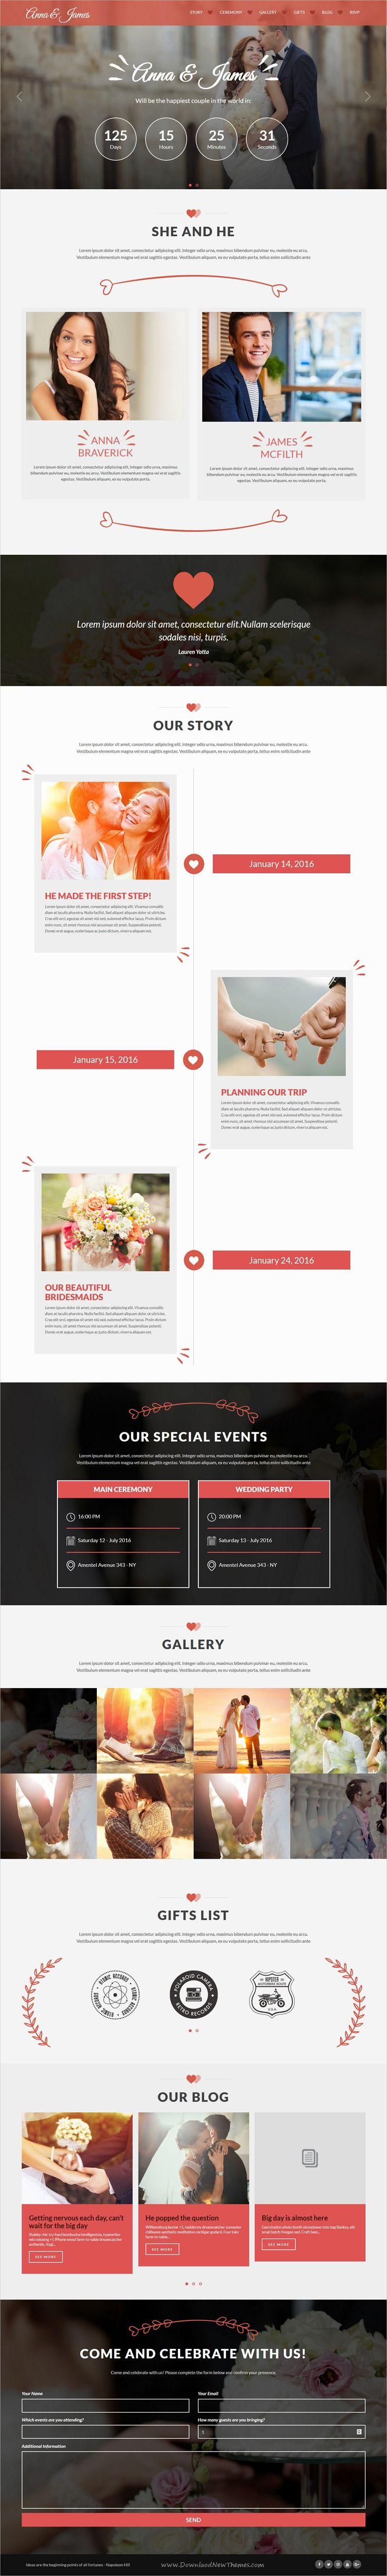 wedding invitation template themeforest%0A Amore Wedding   WordPress Theme for Weddings